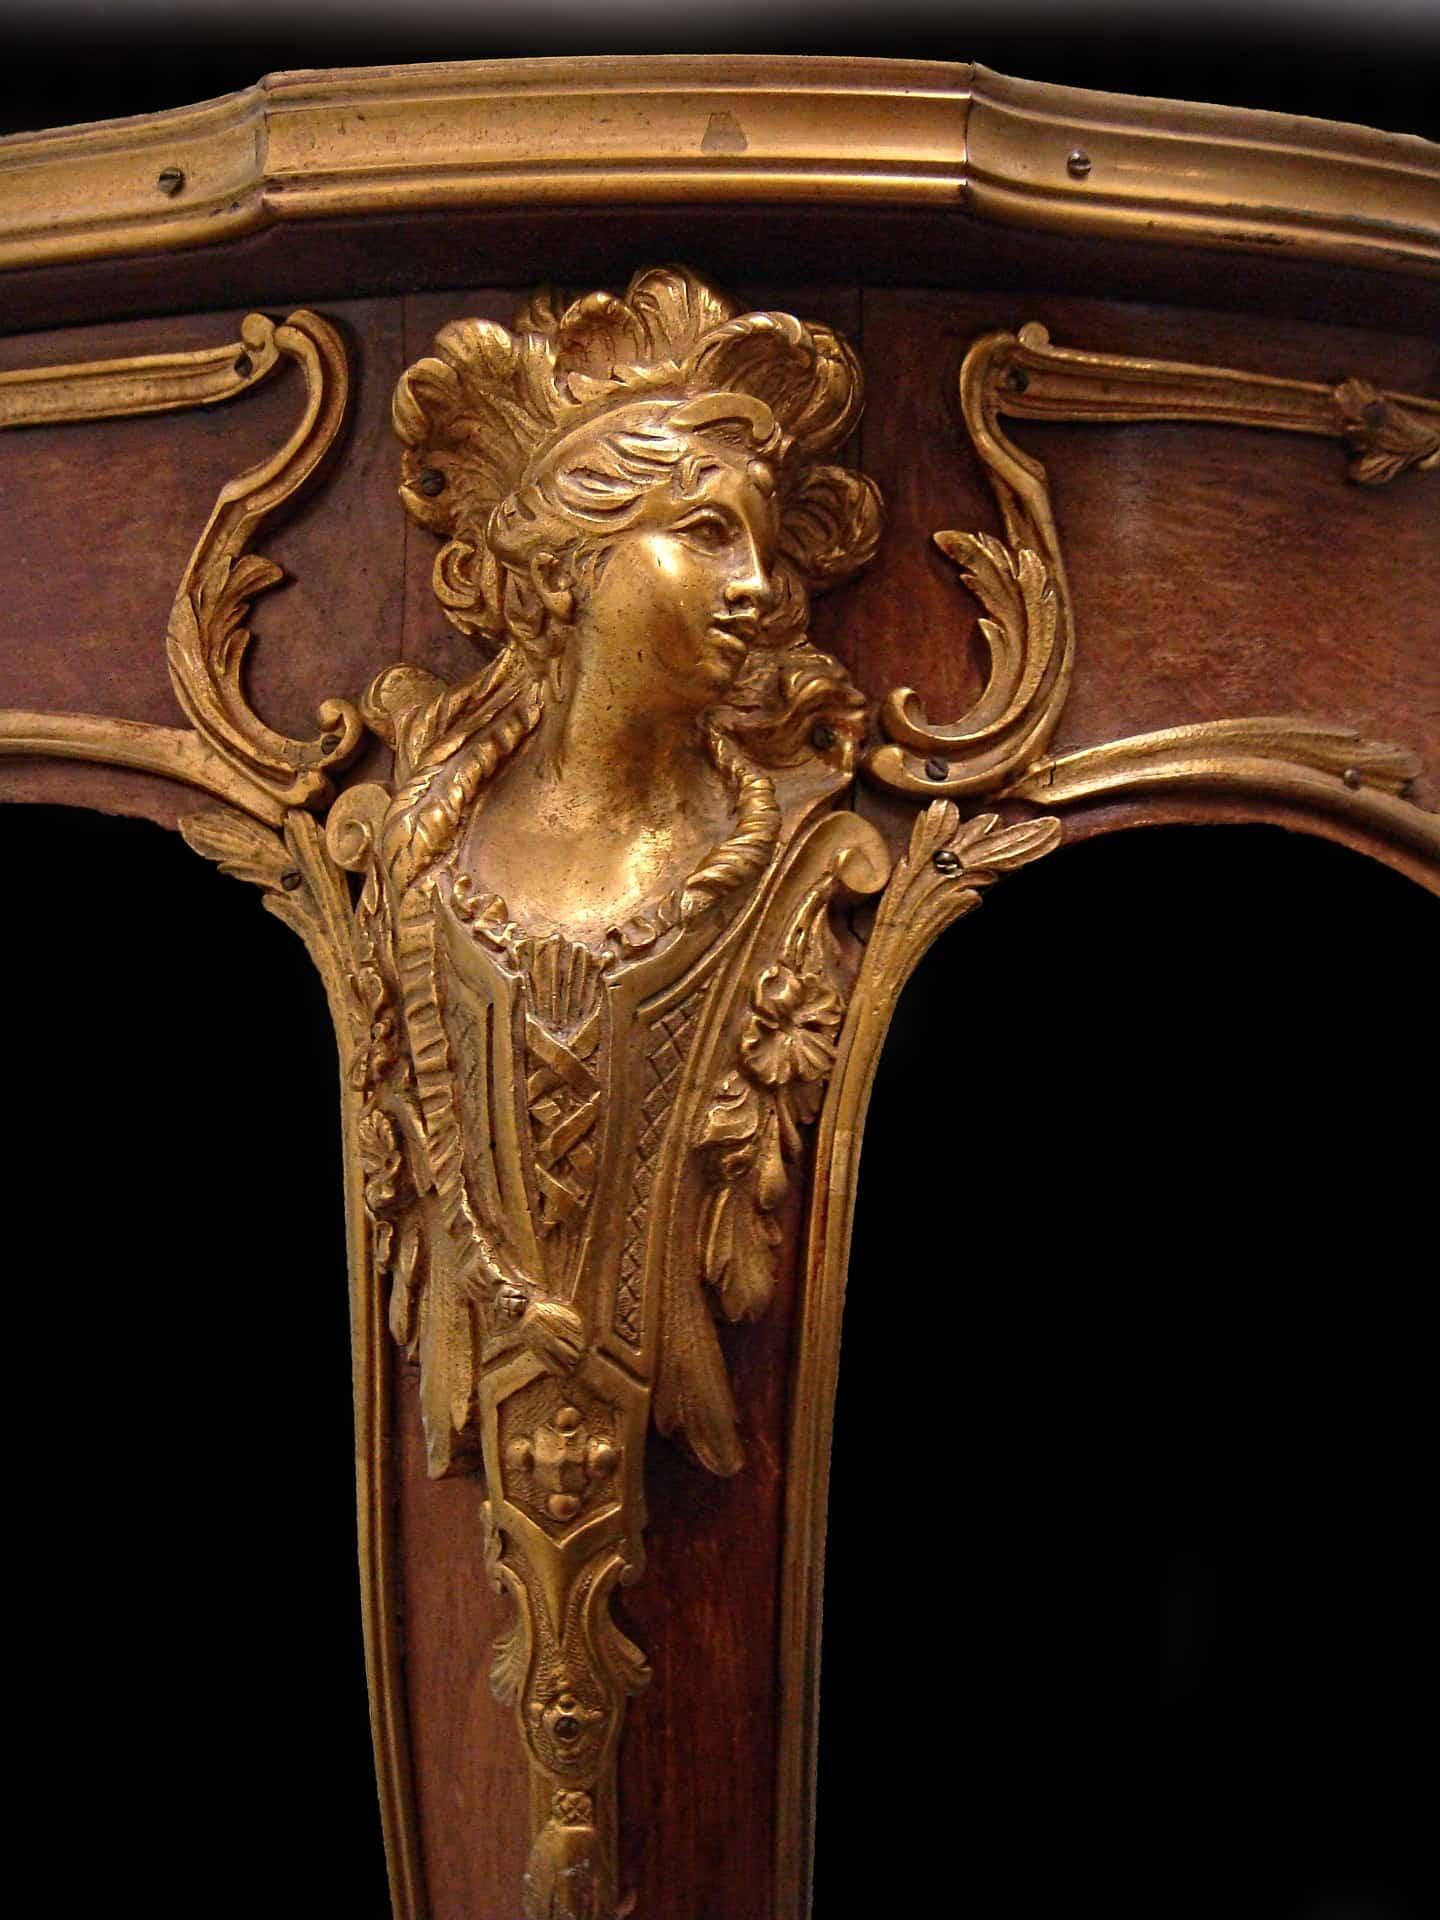 Leg of antique Louis French gilt bronze mounted desk appraisal